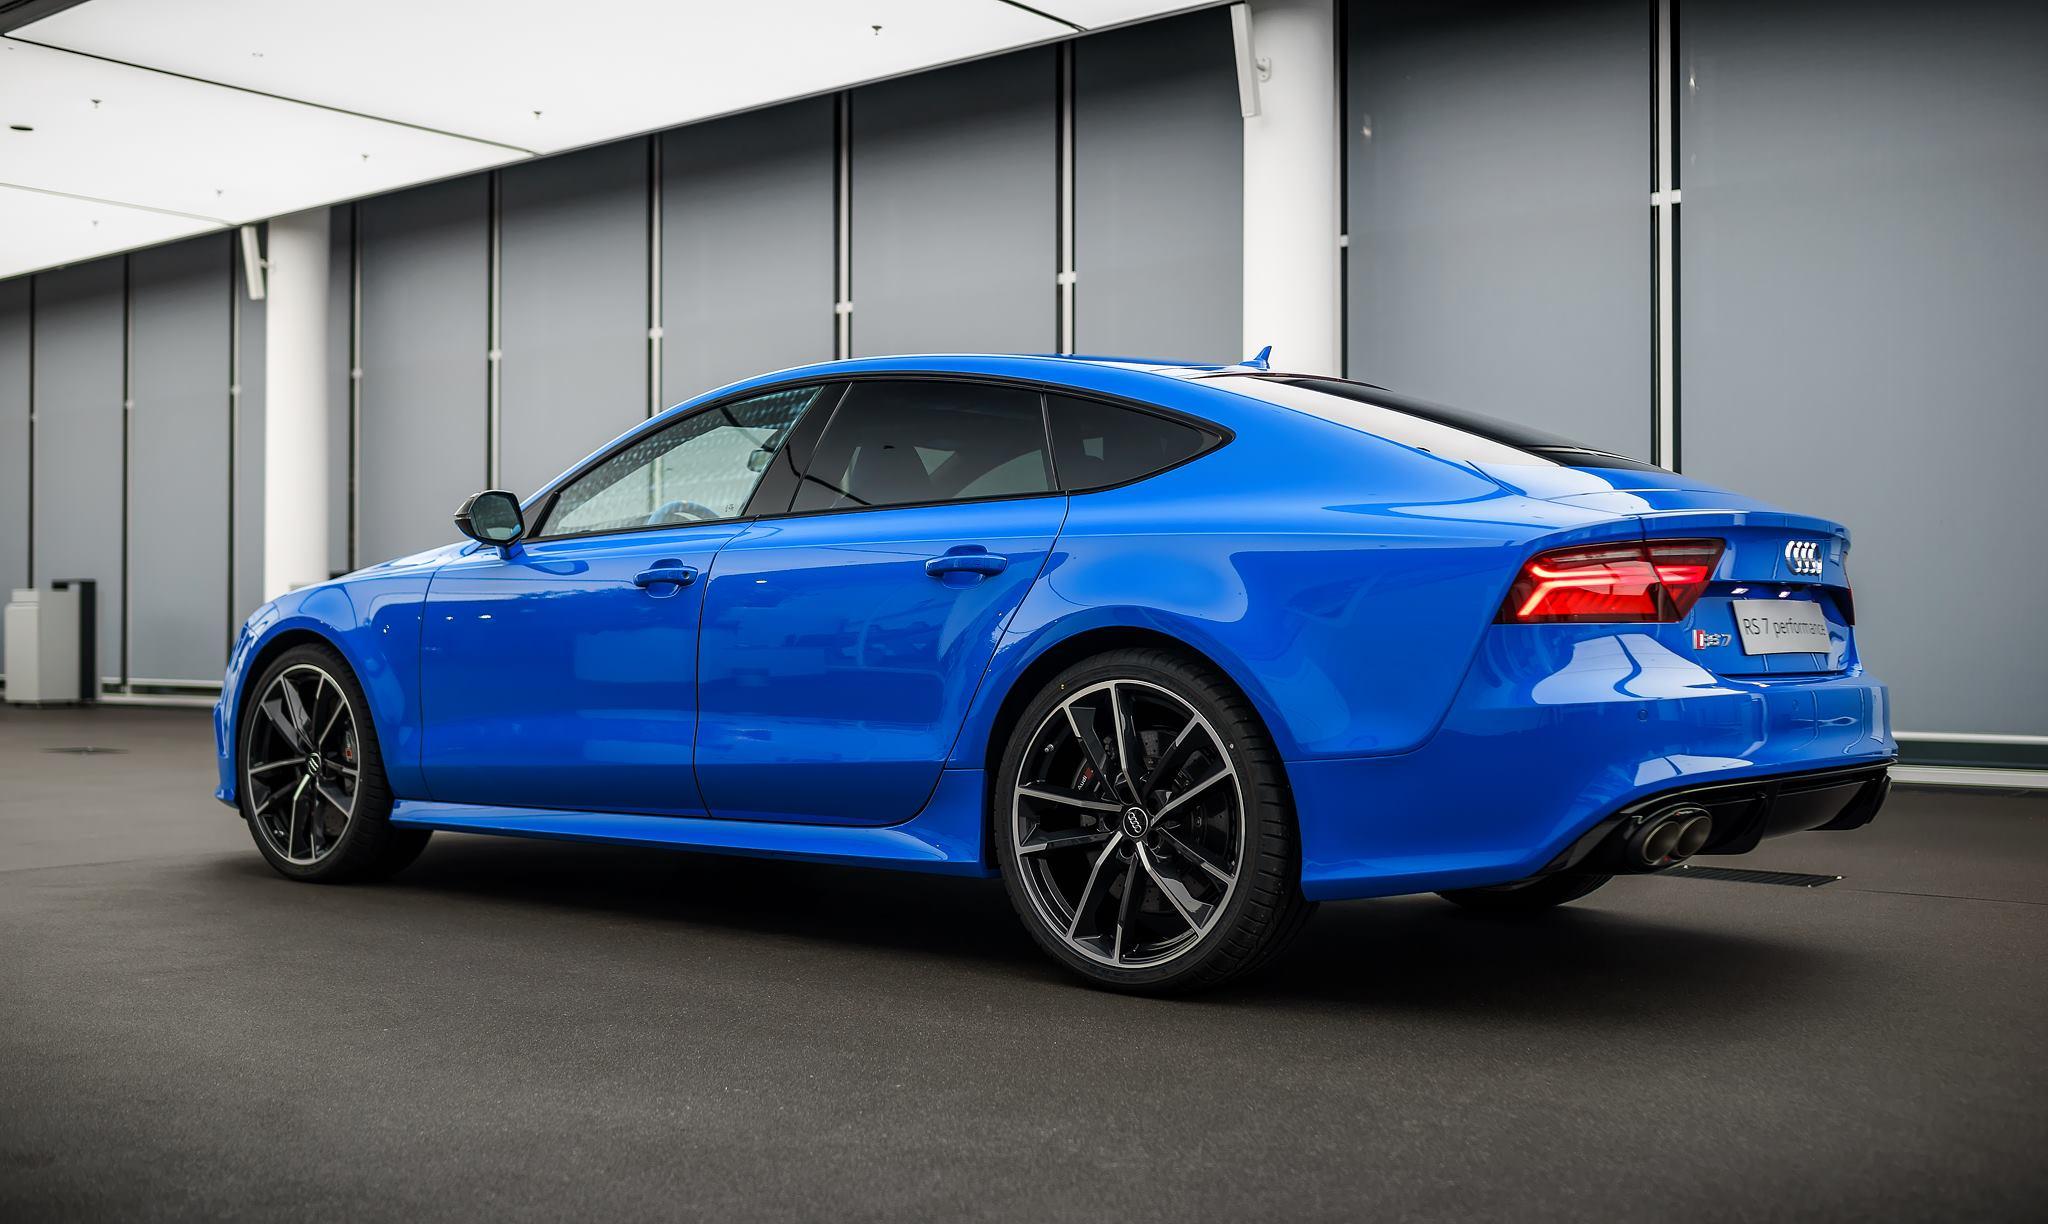 img wrap vinyl olympic vehicle car audi blue shop customization